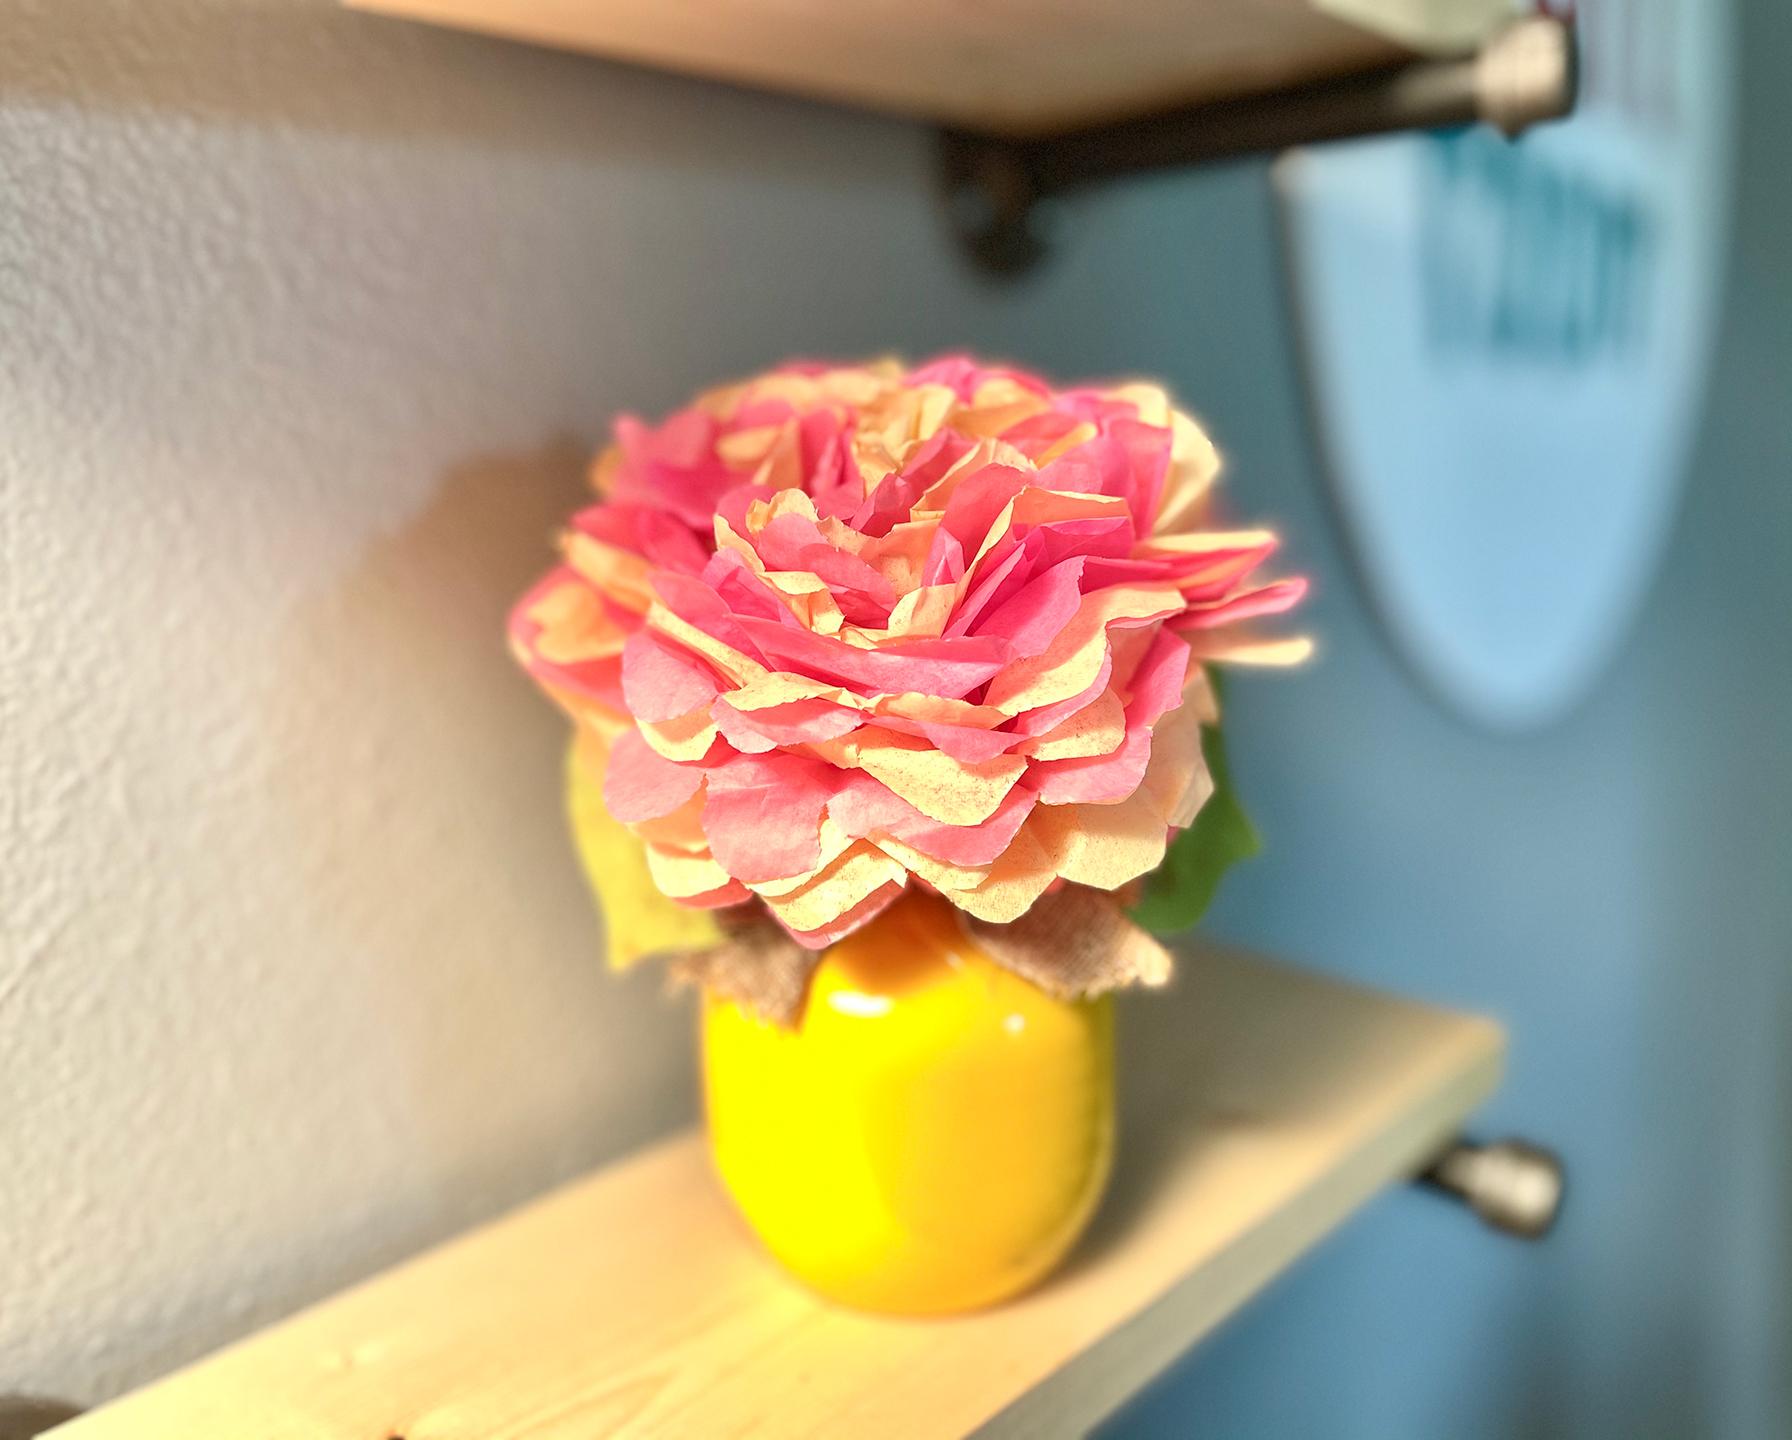 flower on a shelf